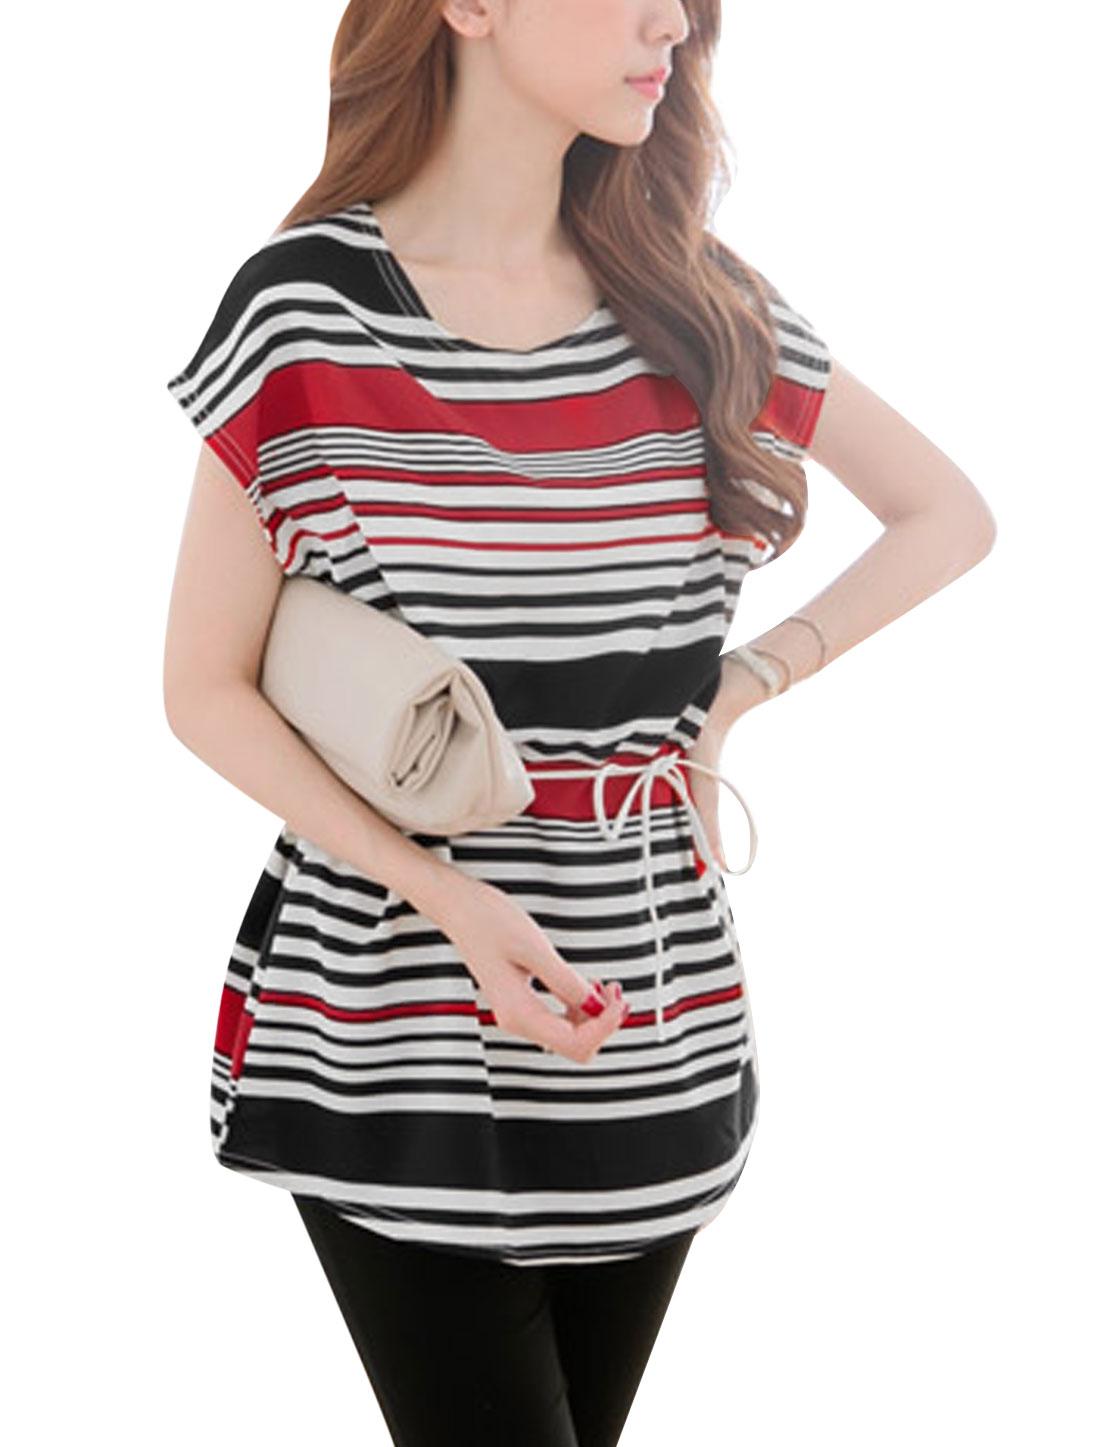 Lady Short Sleeve Stripes Pattern Mesh Splice Leisure Tunic Top w Belt Red S